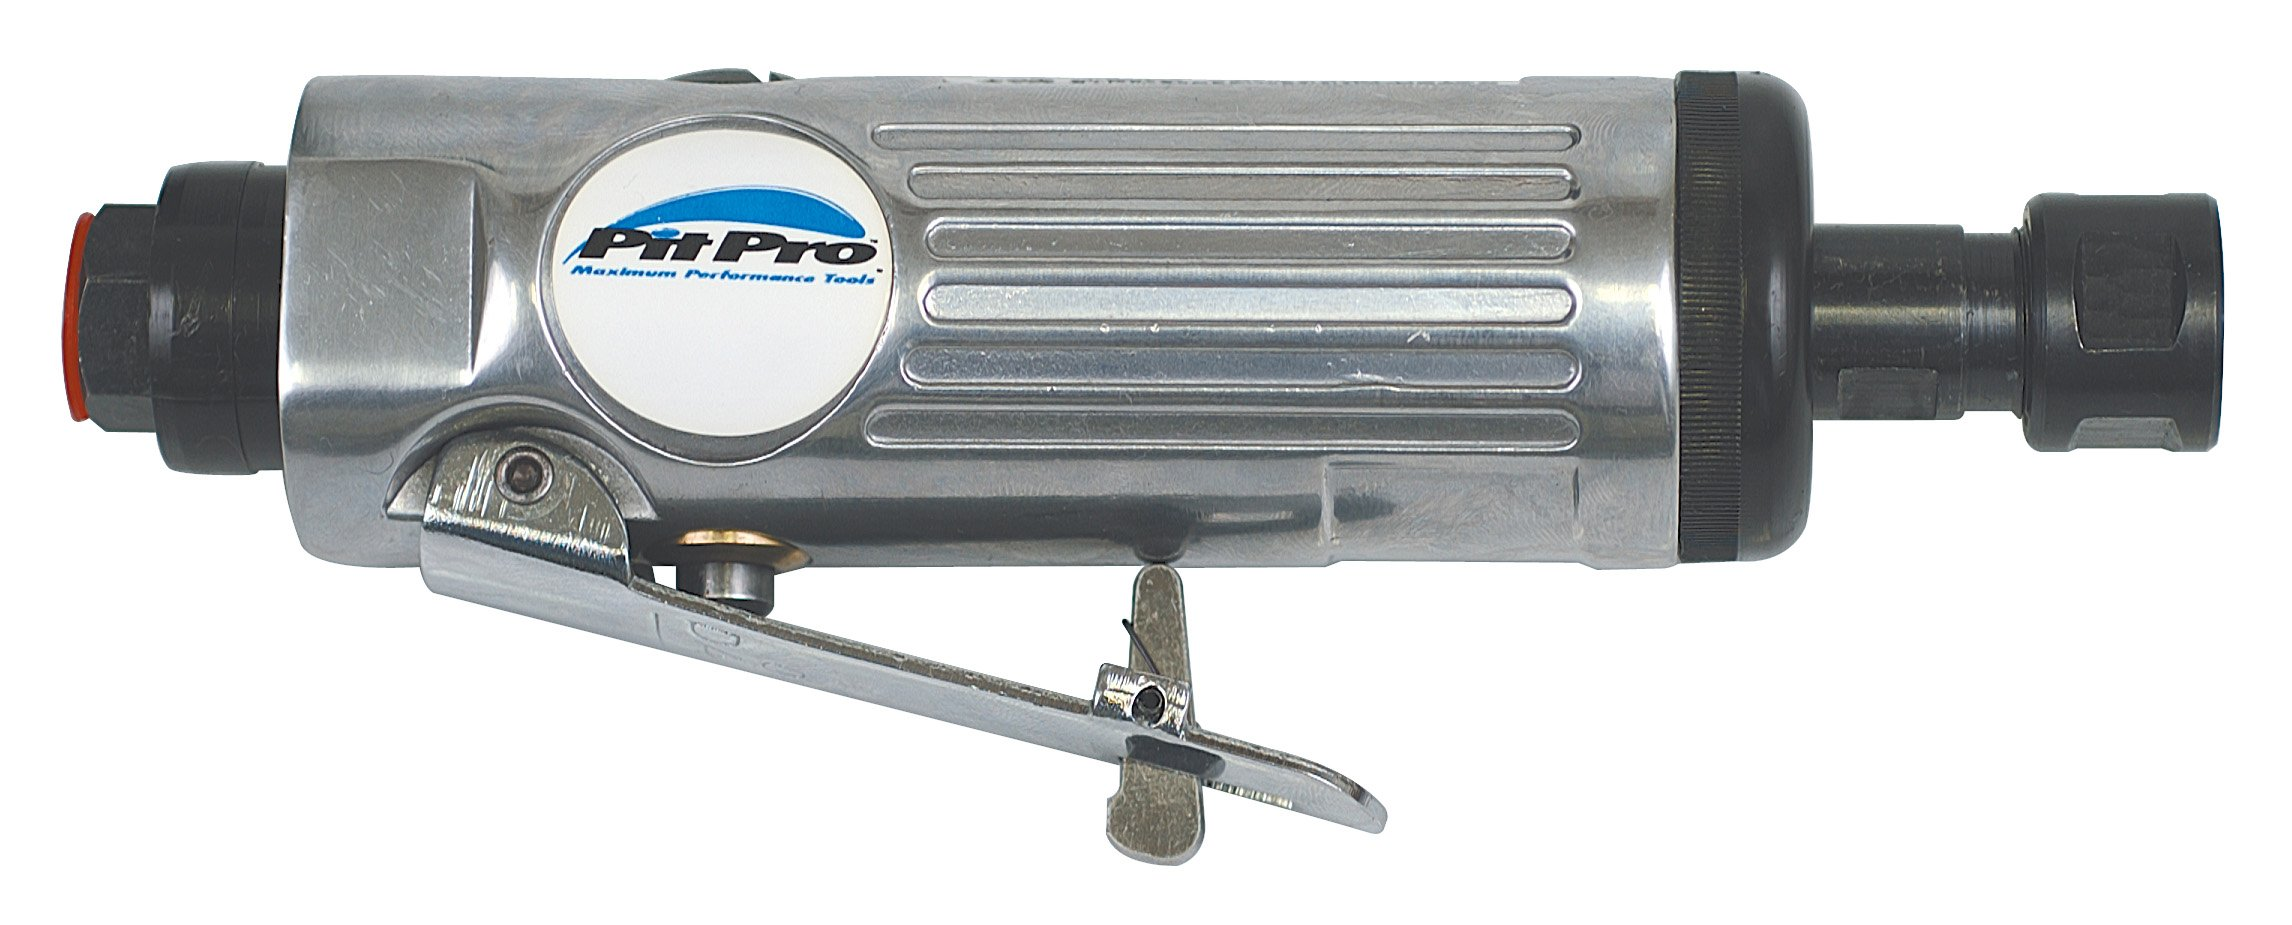 Pit Pro PT2430 Full Size Straight Grinder